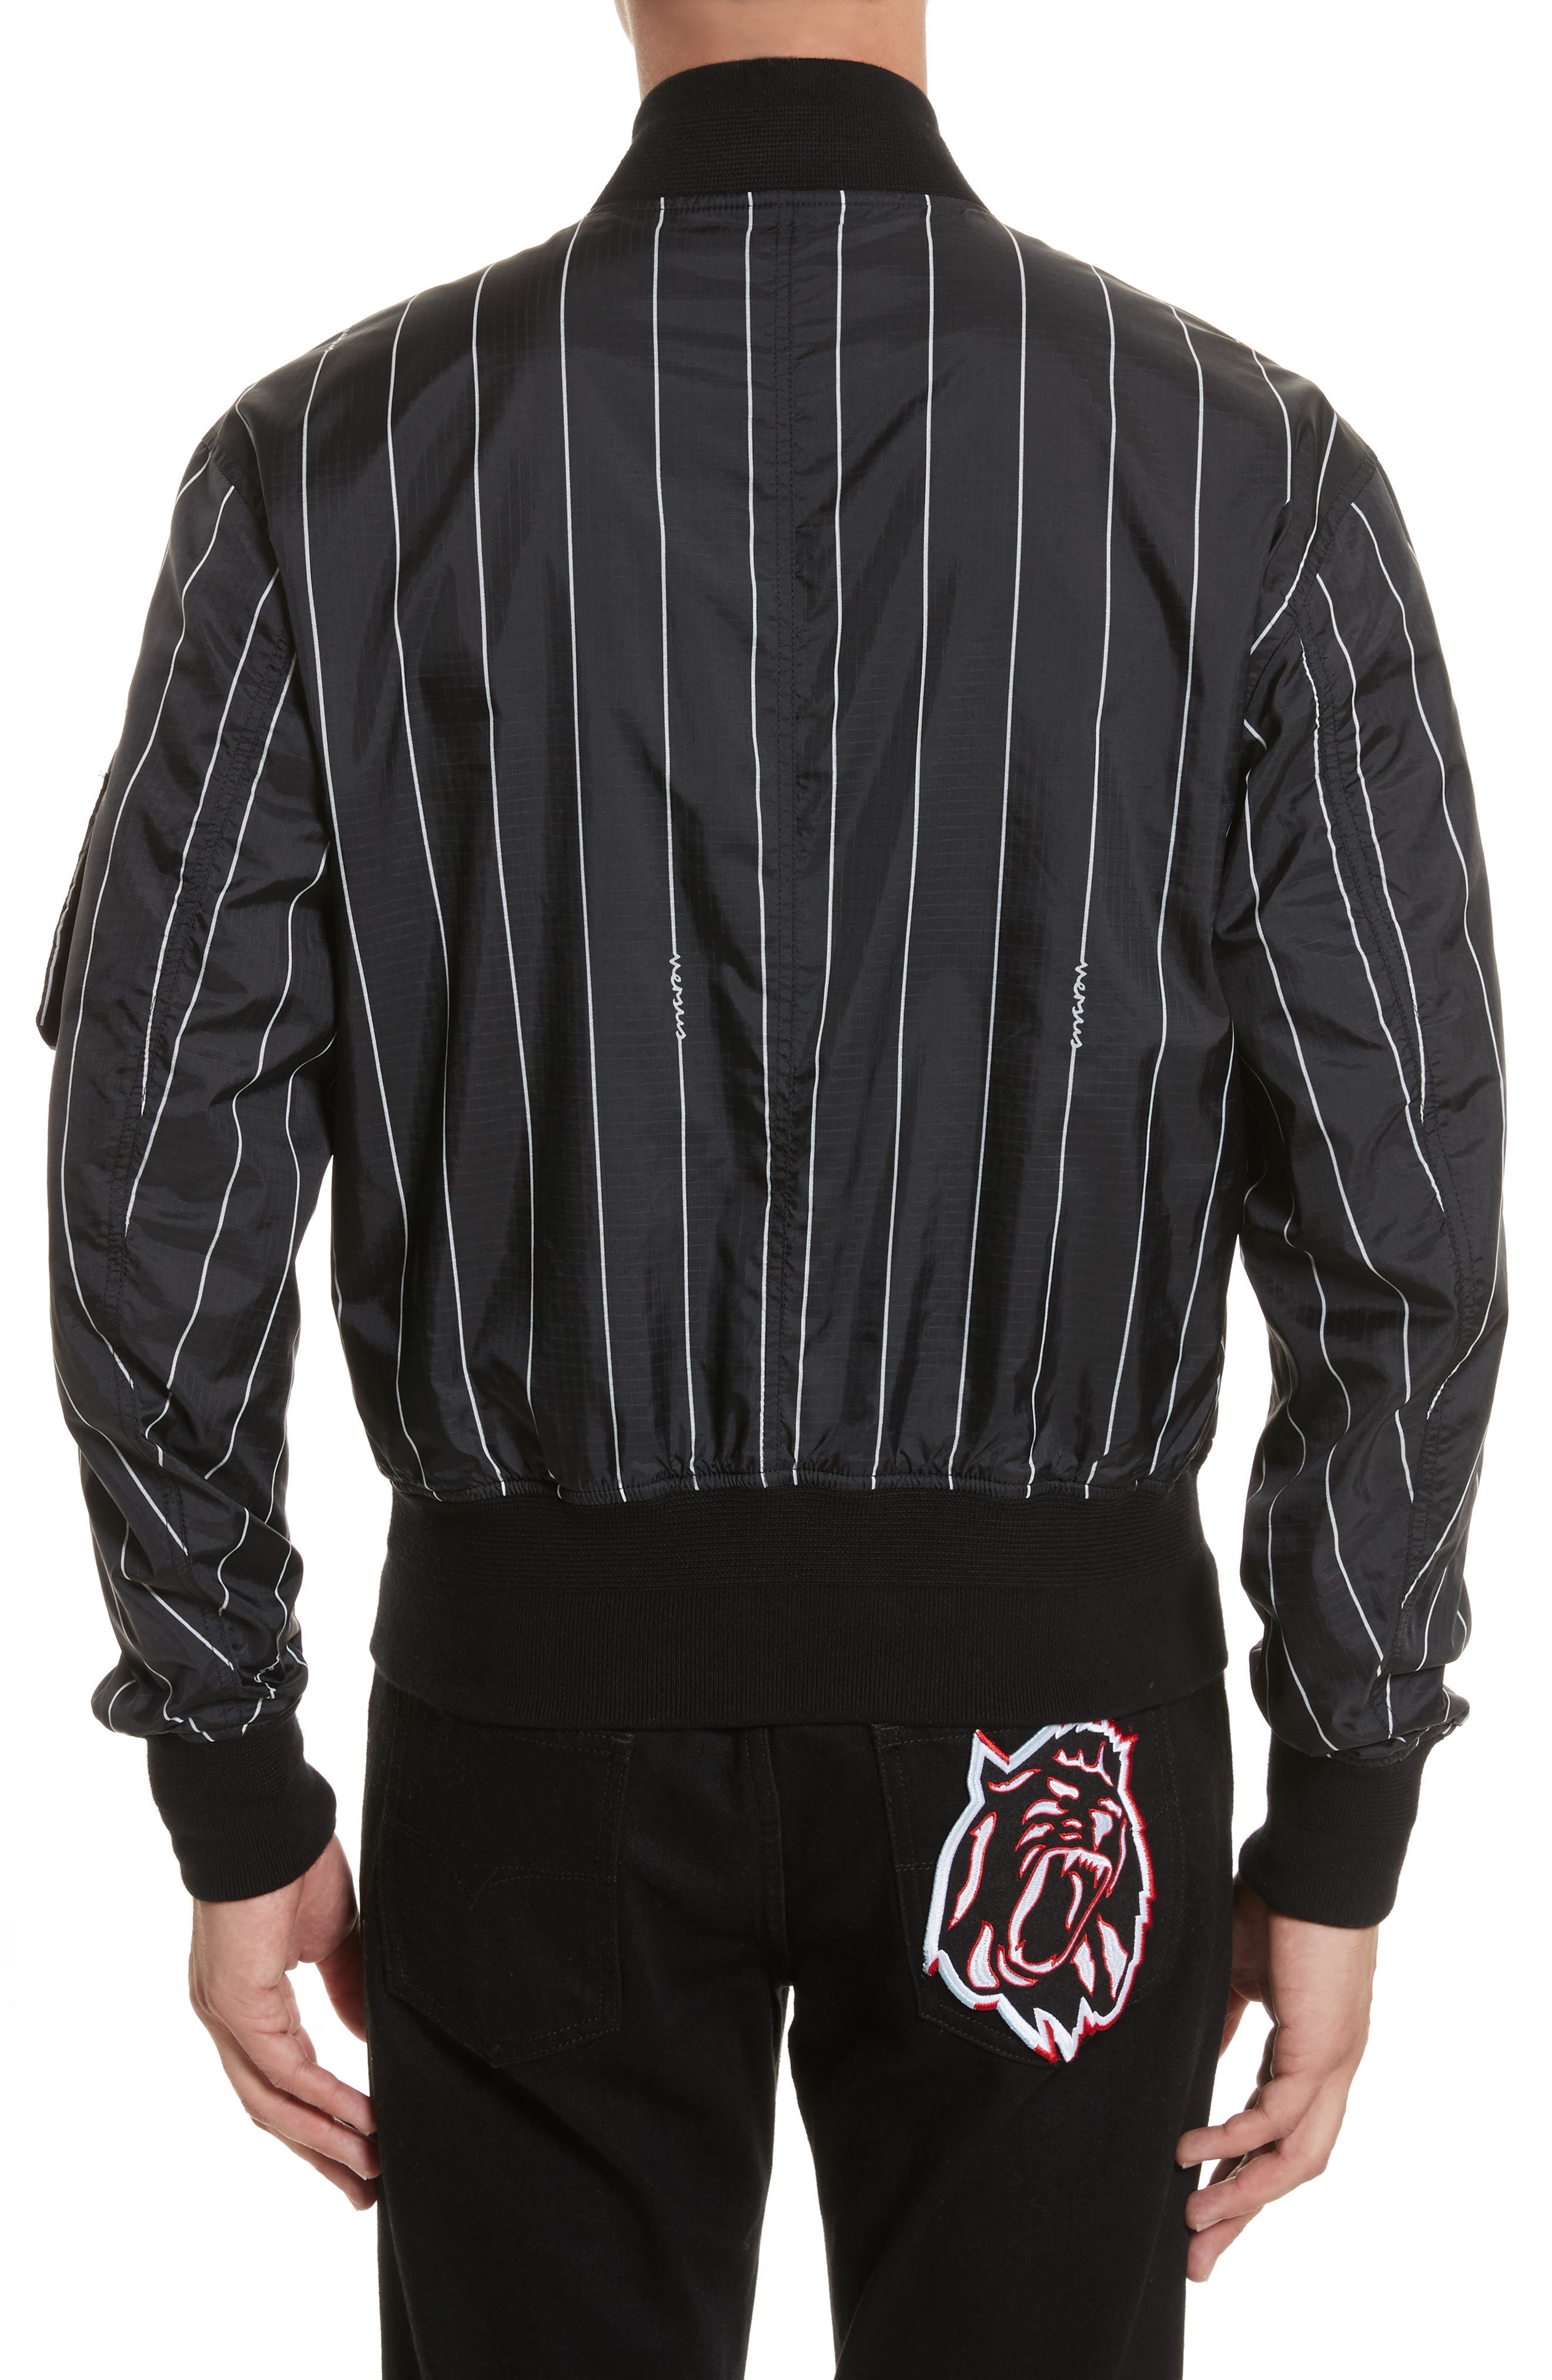 VERSUS by Versace Reversible Pinstripe Bomber Jacket,                             Alternate thumbnail 2, color,                             Black